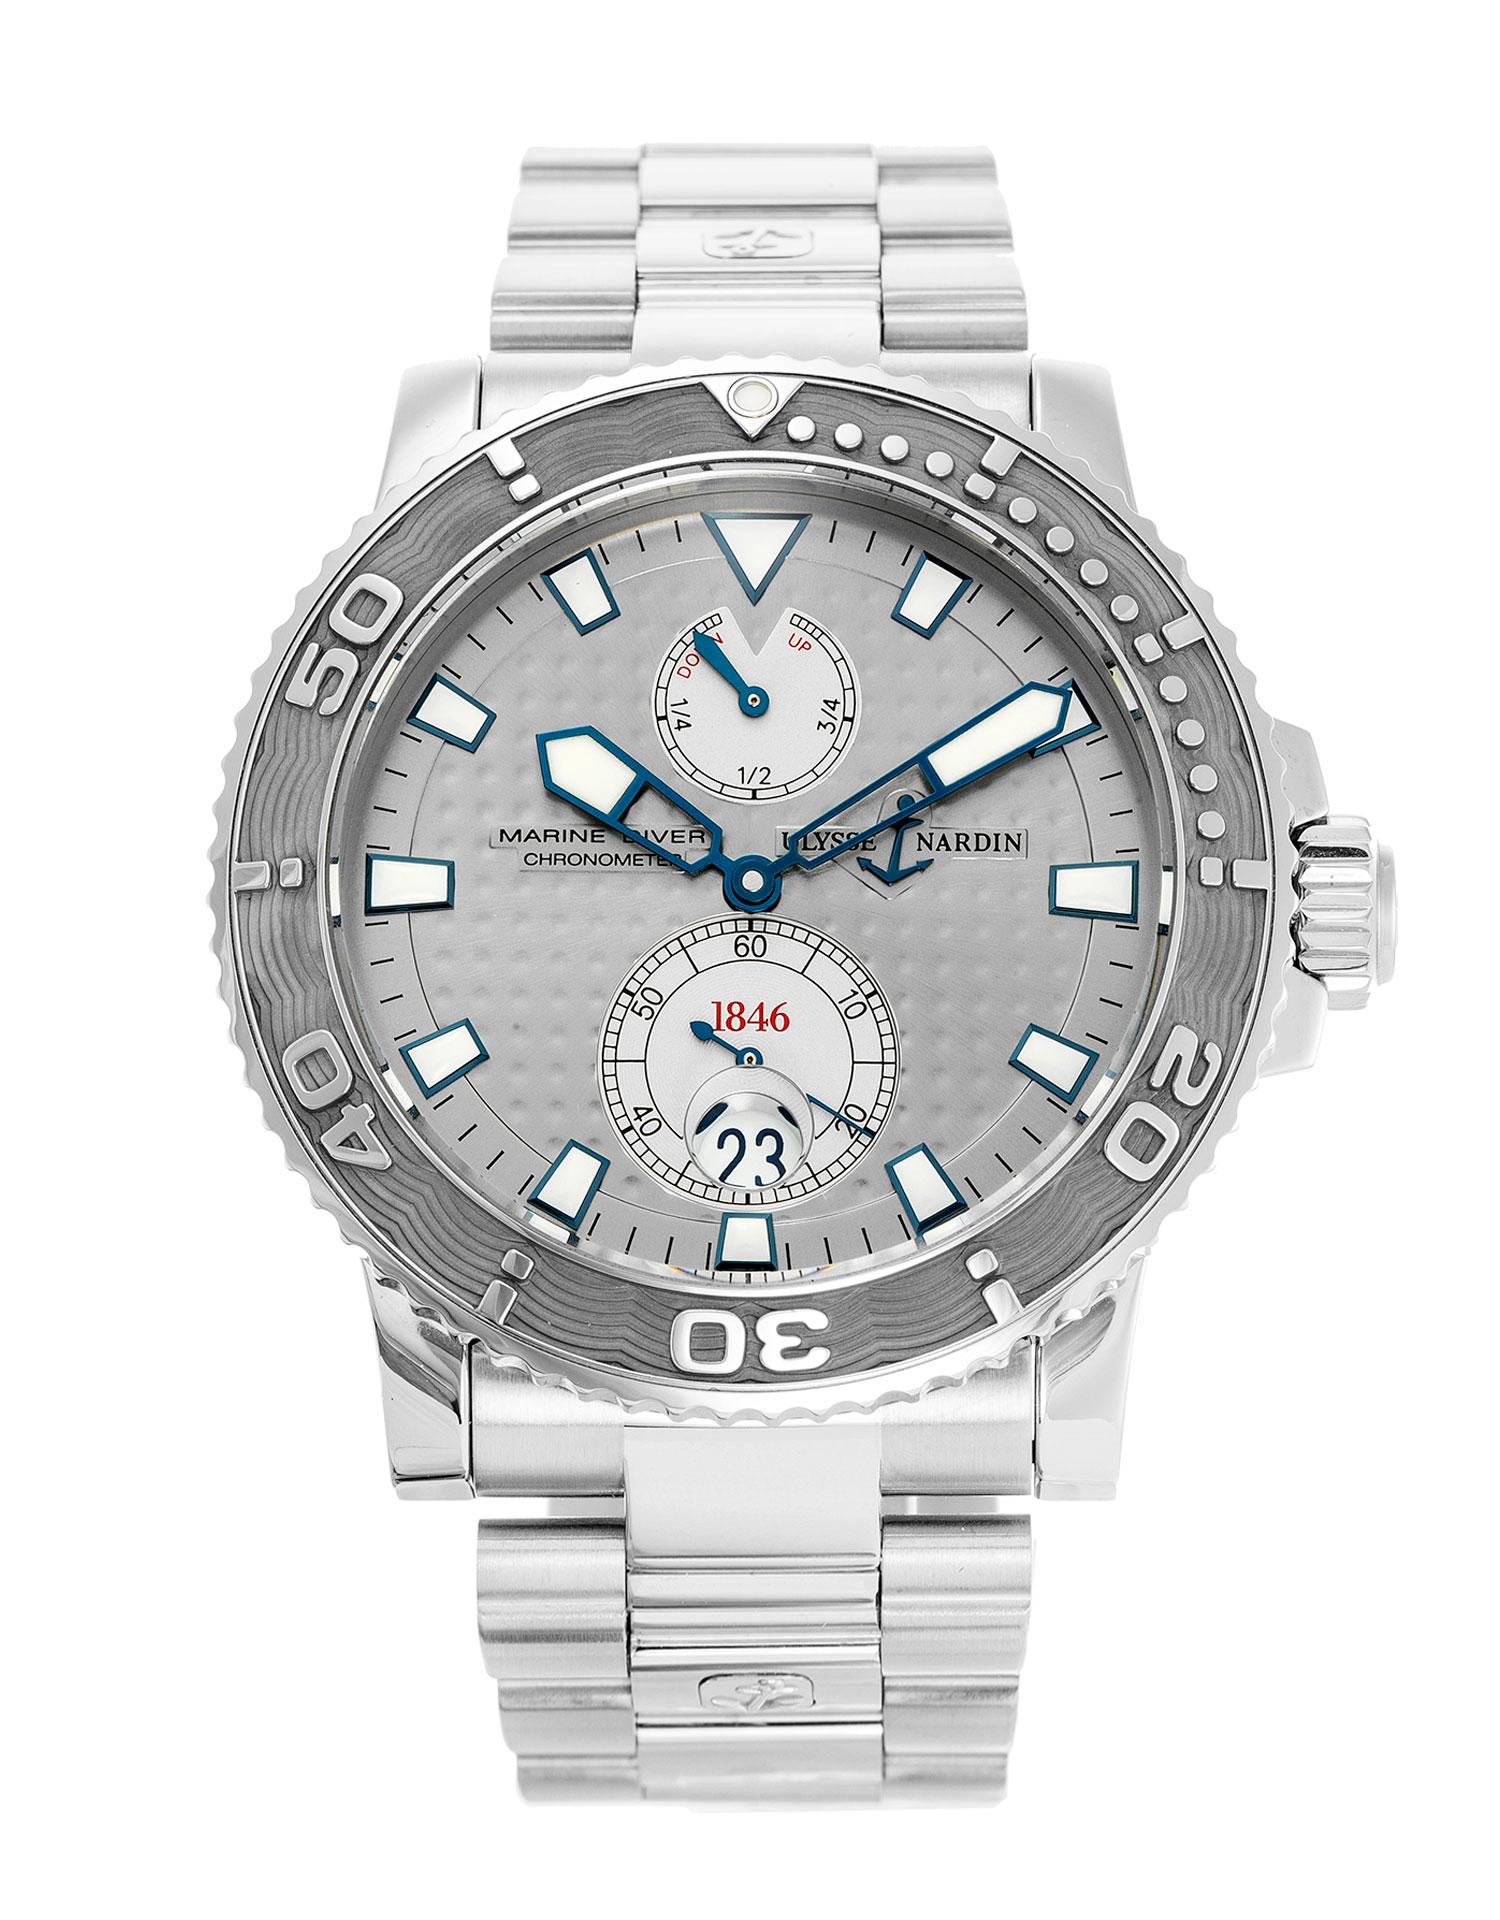 подарок часы ulysse nardin 263 33 цена marine chronometer #1132 аромат дополнительном флаконе